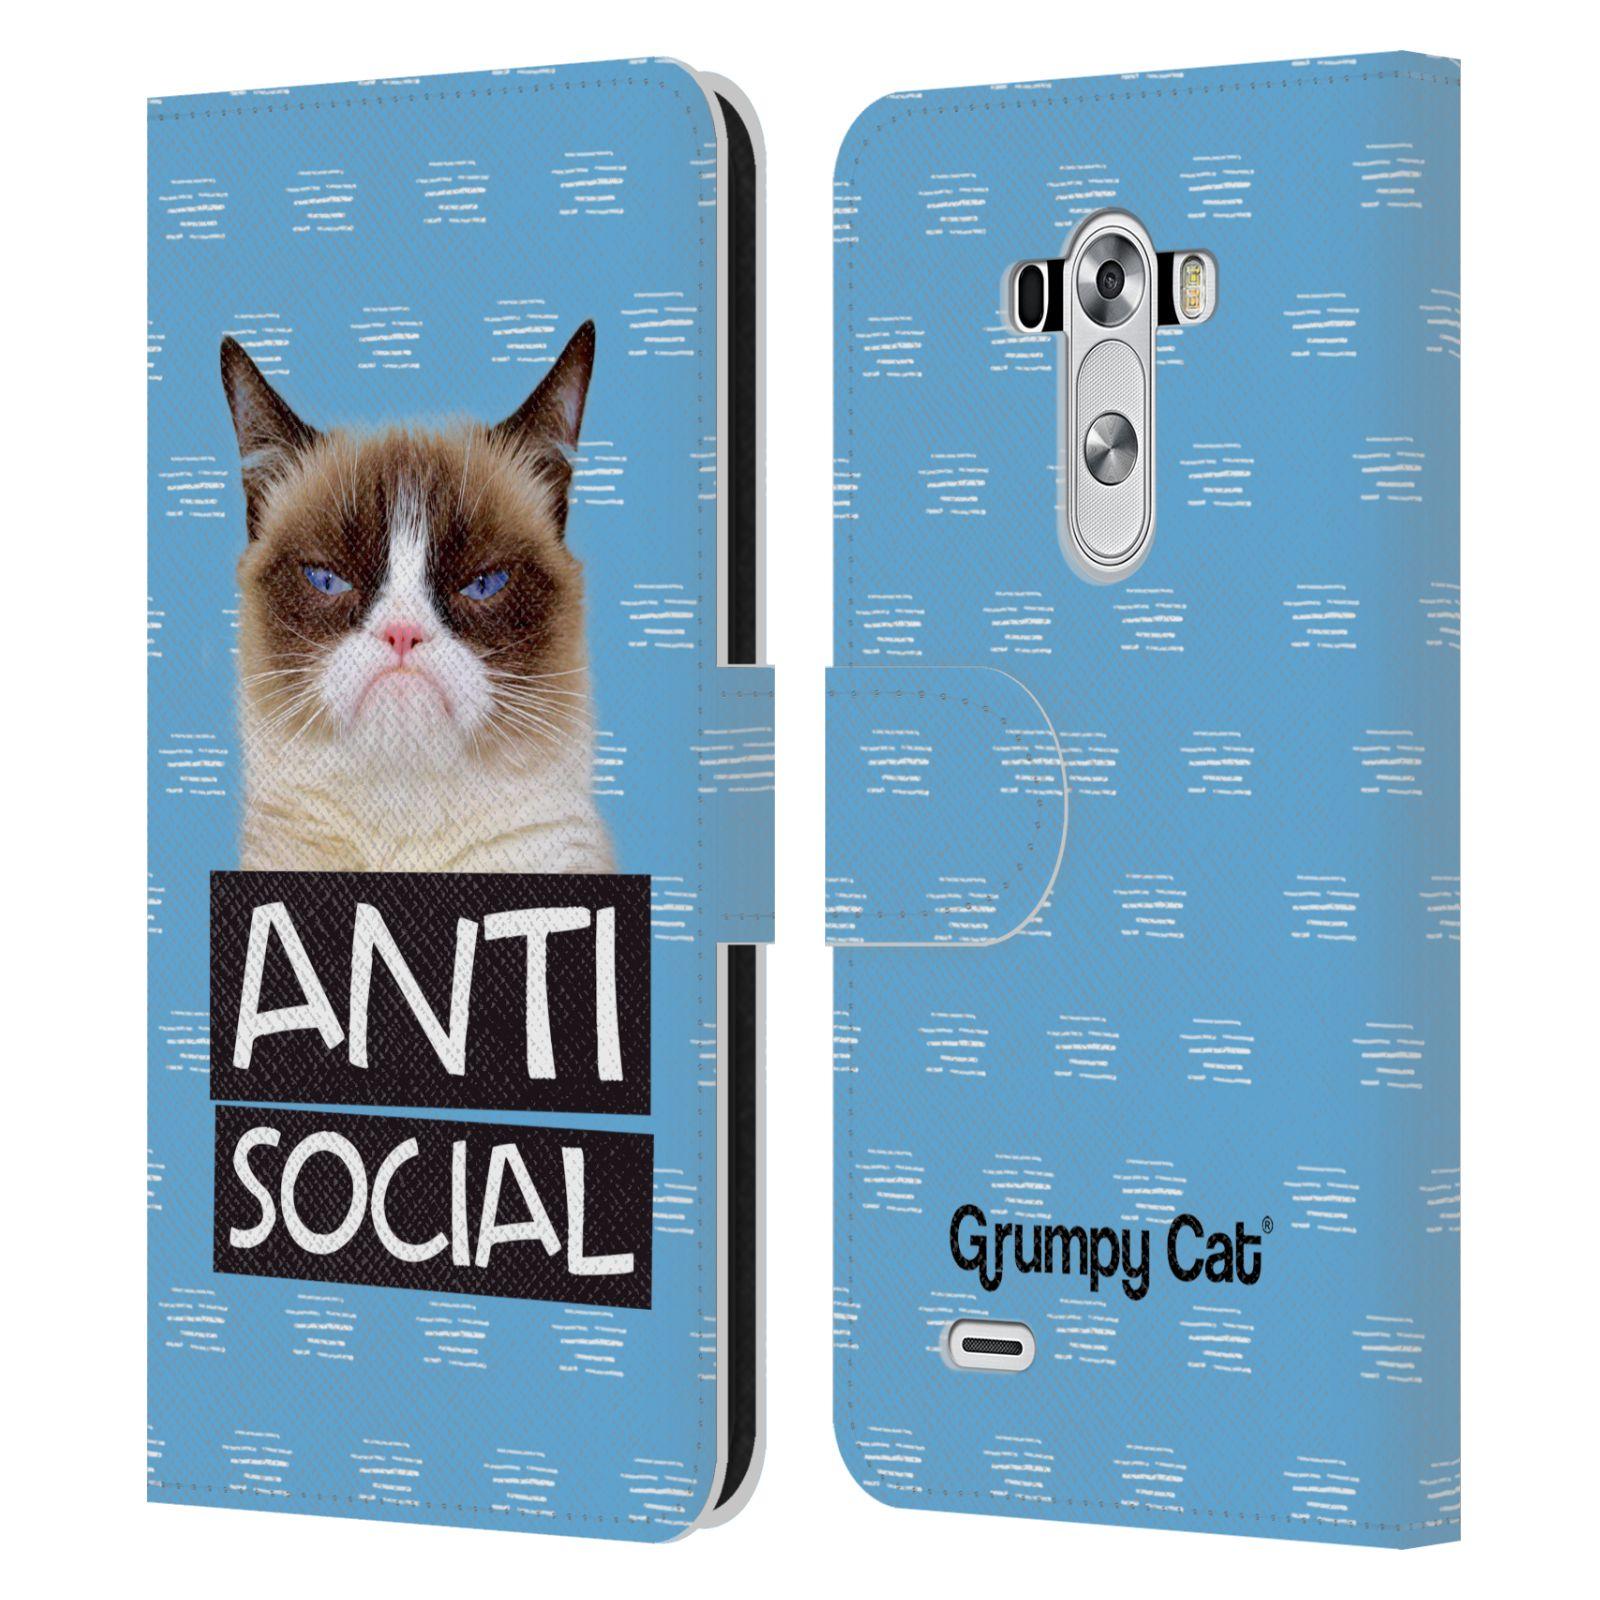 offizielle grumpy cat zitate brieftasche handyh lle aus leder f r lg handys 1 ebay. Black Bedroom Furniture Sets. Home Design Ideas